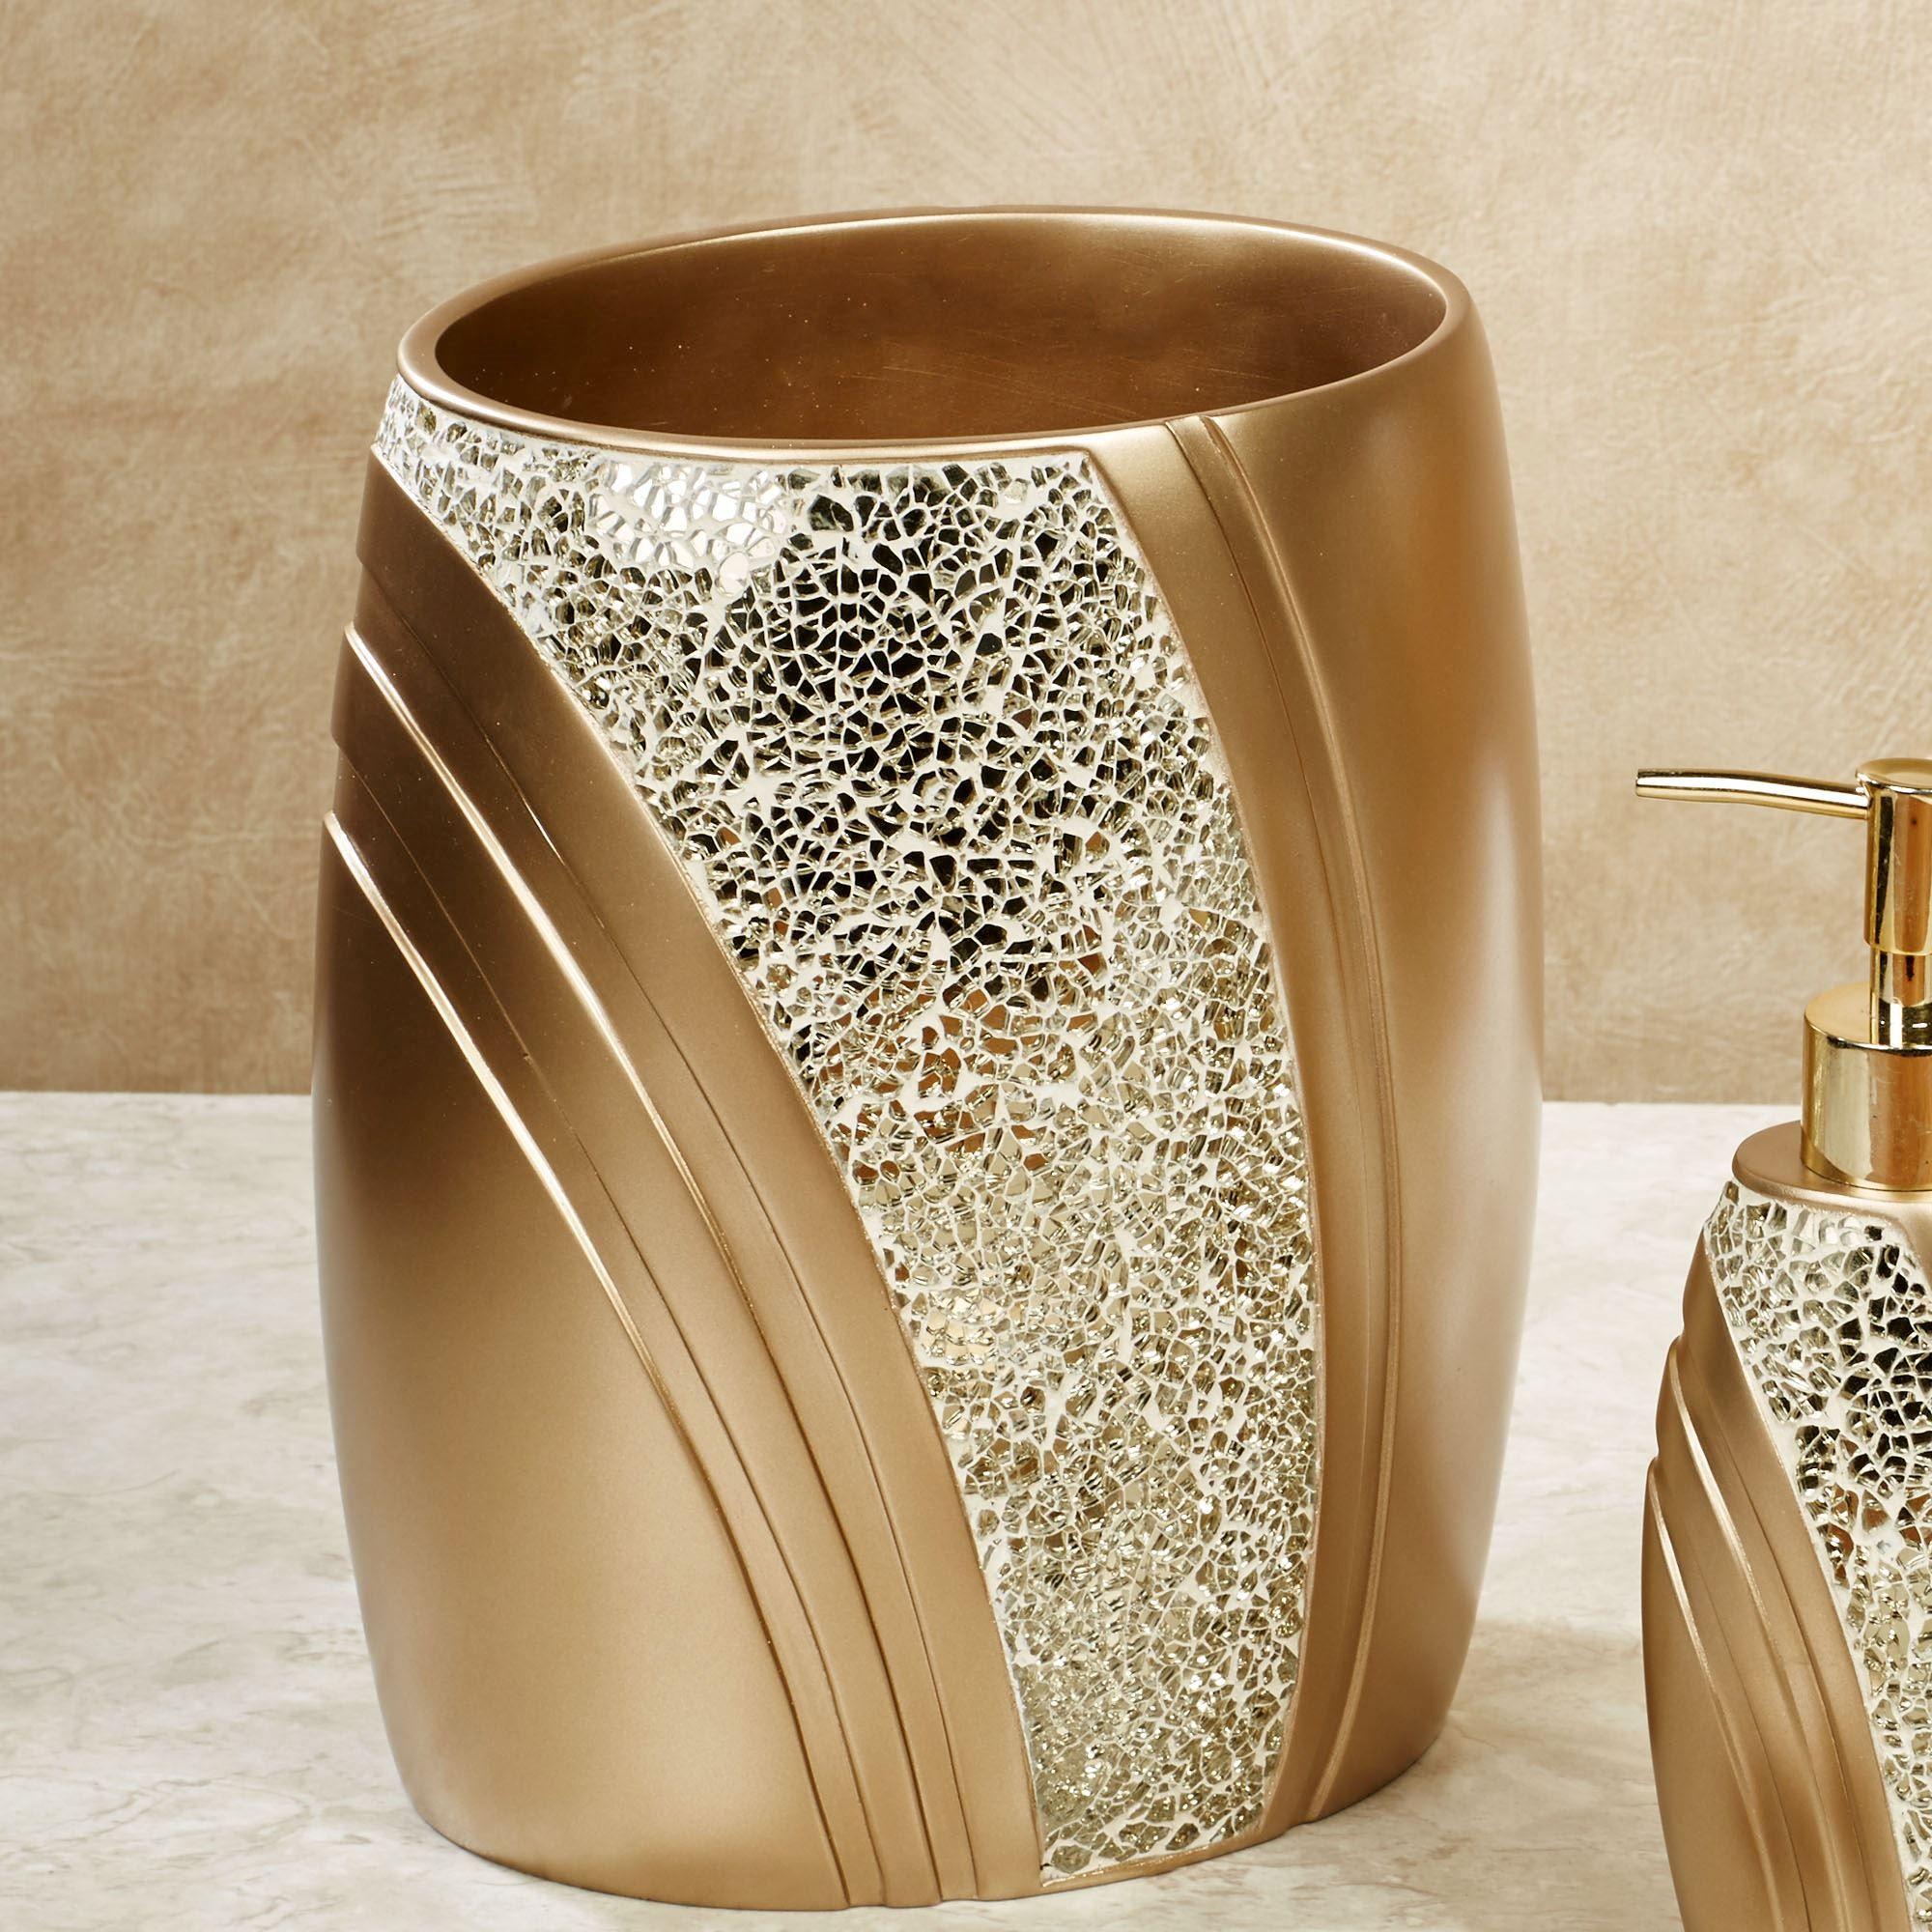 Very Gold Mosaic Bathroom Accessories Glamour Wastebasket Champagne Bath